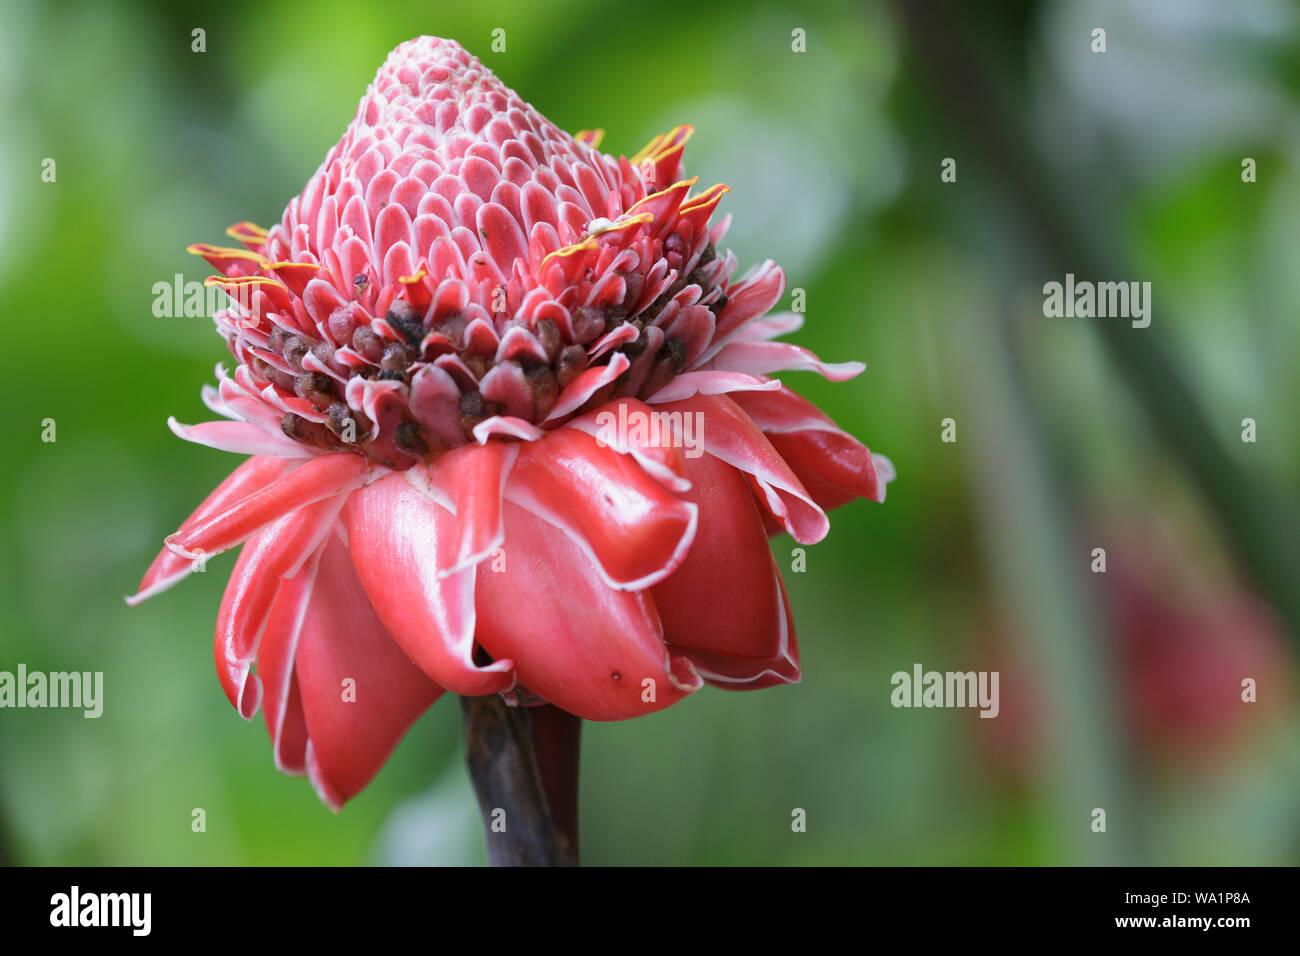 Flor de cera de Etlingera elatior o filipina. Es una especie de planta herbácea perenne. Foto de stock